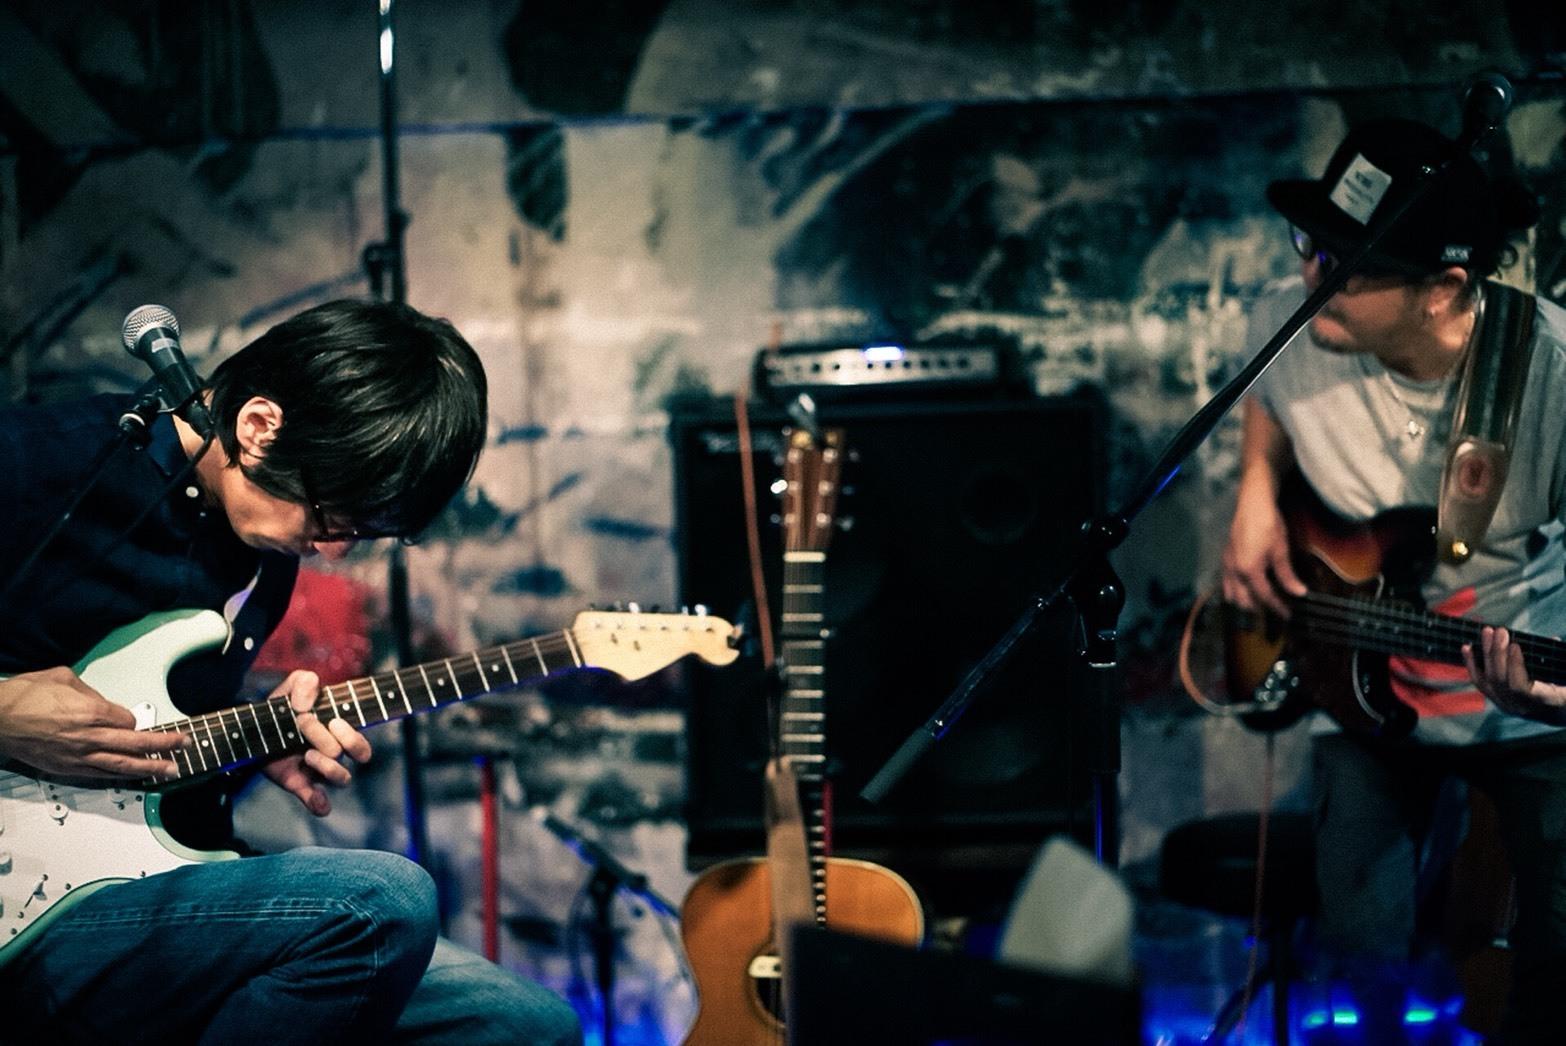 『Floating Strings』リリースライブ、ありがとうございました!_d0110708_10413590.jpg